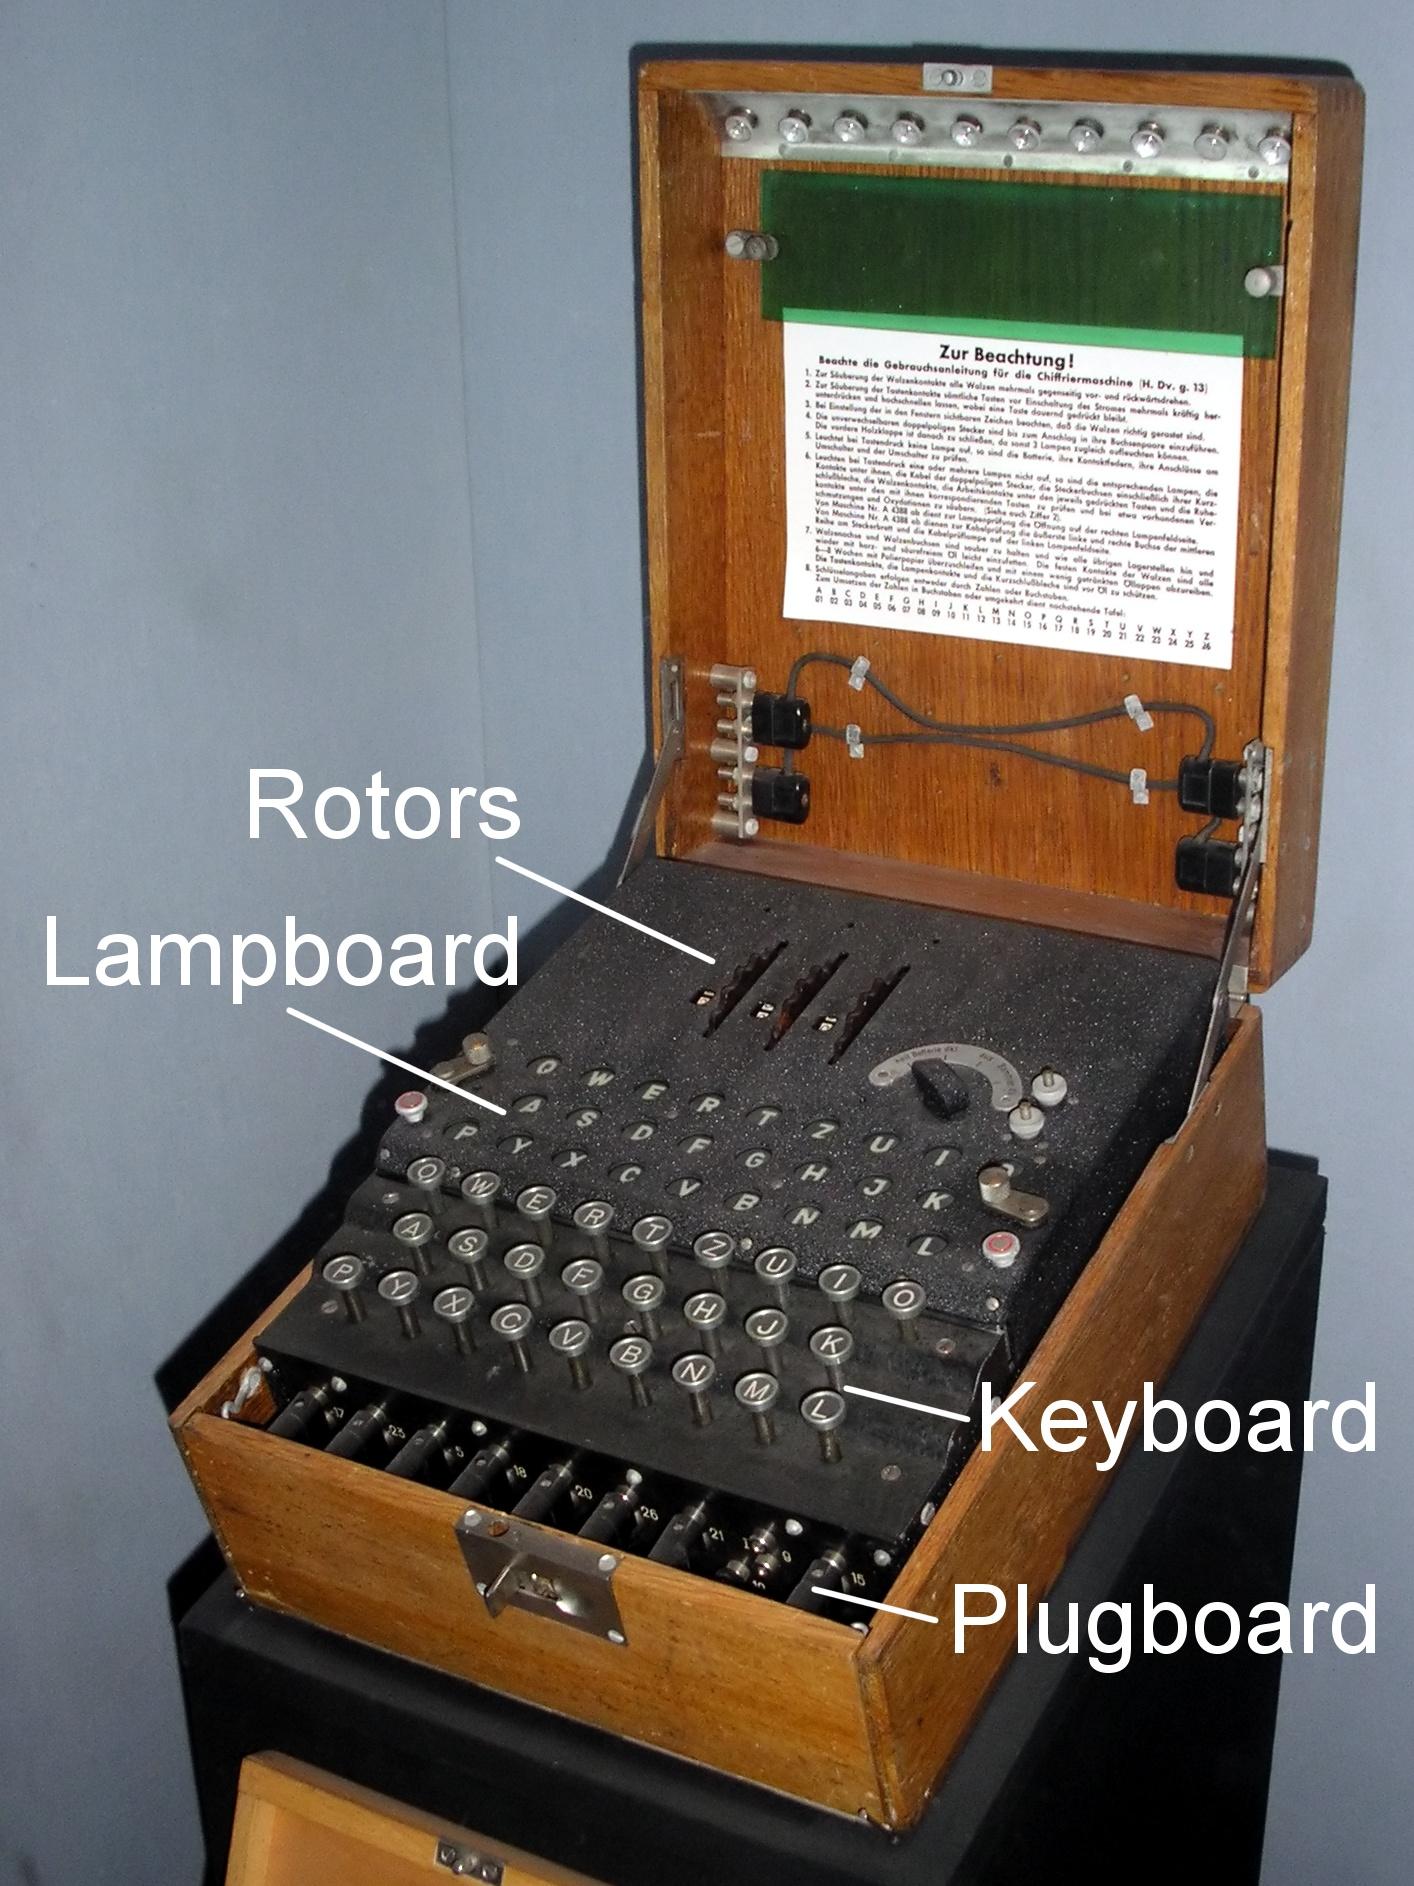 https://upload.wikimedia.org/wikipedia/commons/3/3e/EnigmaMachineLabeled.jpg